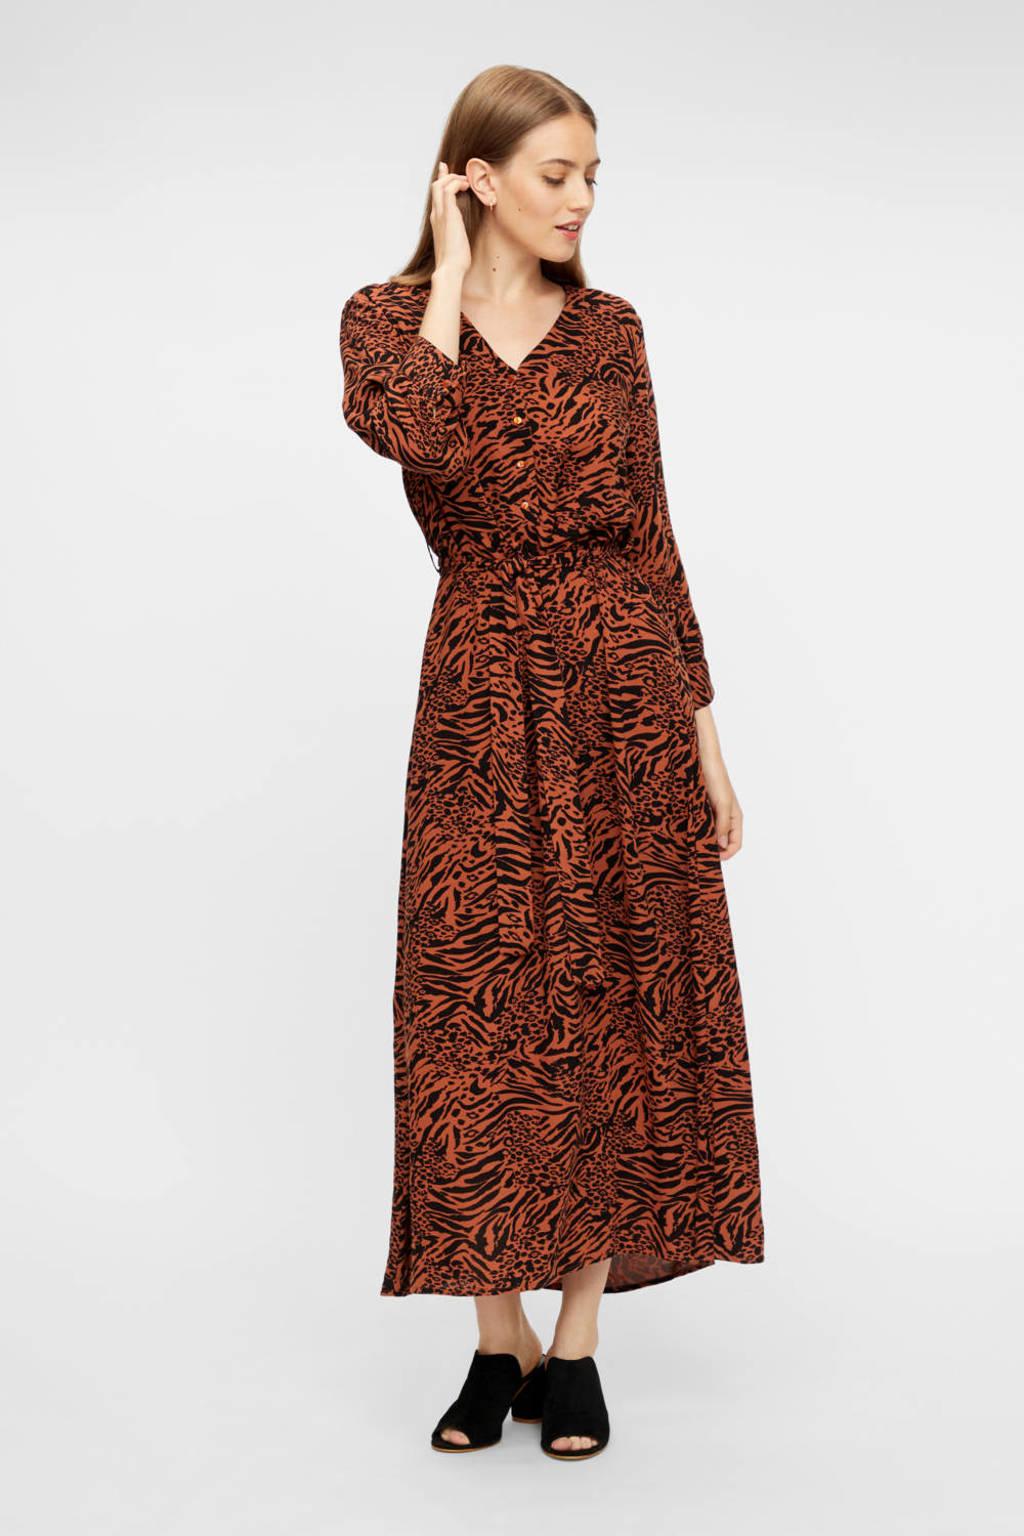 PIECES maxi jurk Brenna met all over print en ceintuur bruin/zwart, Bruin/zwart